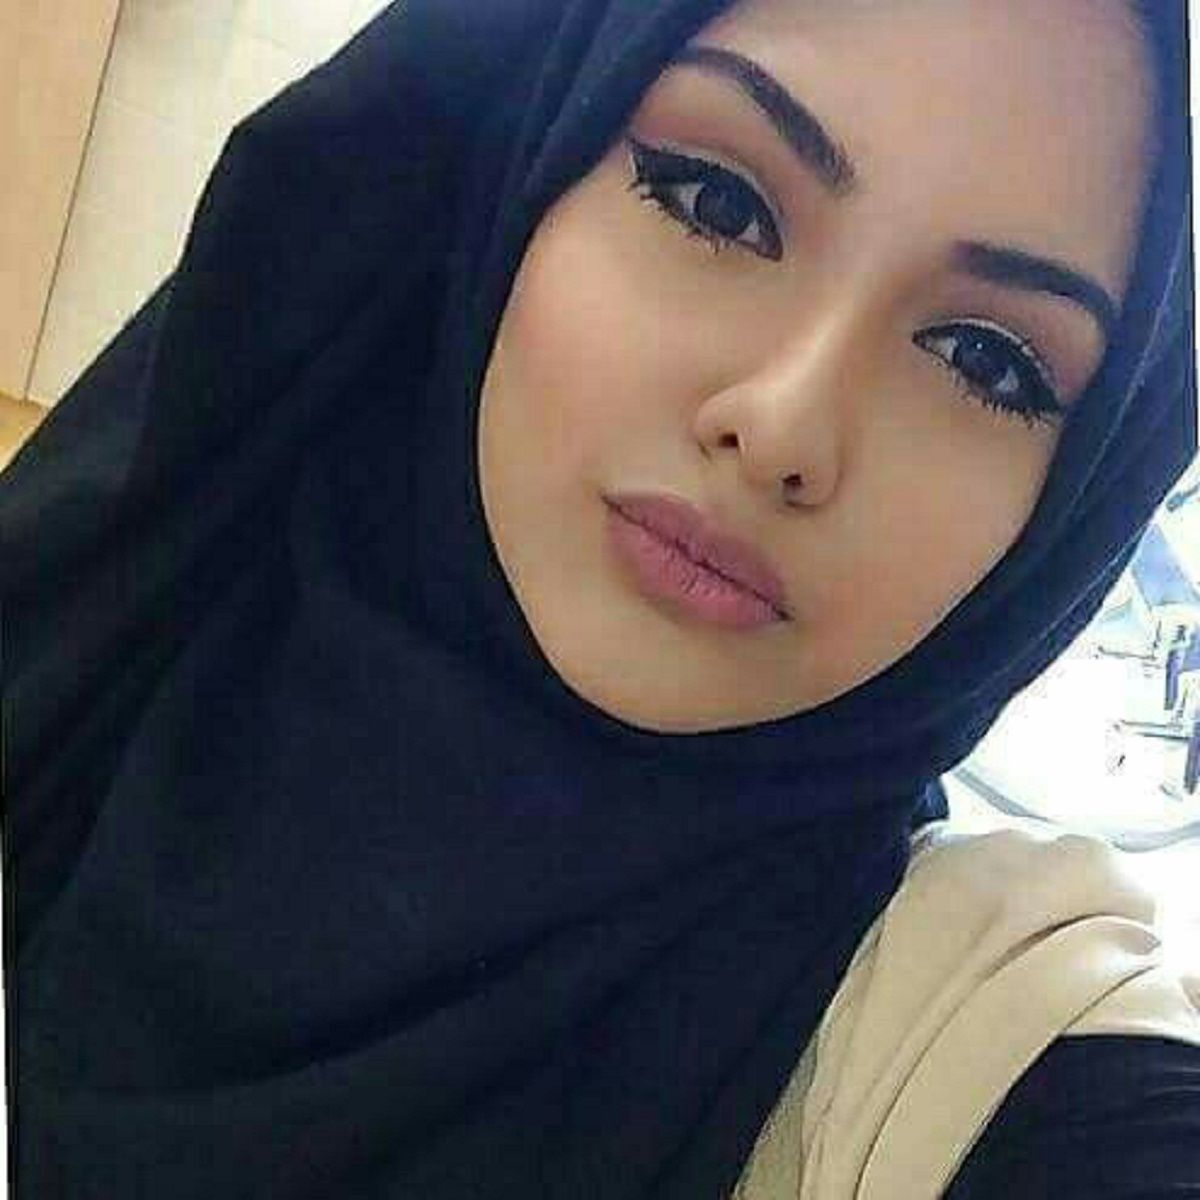 بالصور بنات السعوديه , جمال بنات السعوديه 83 3